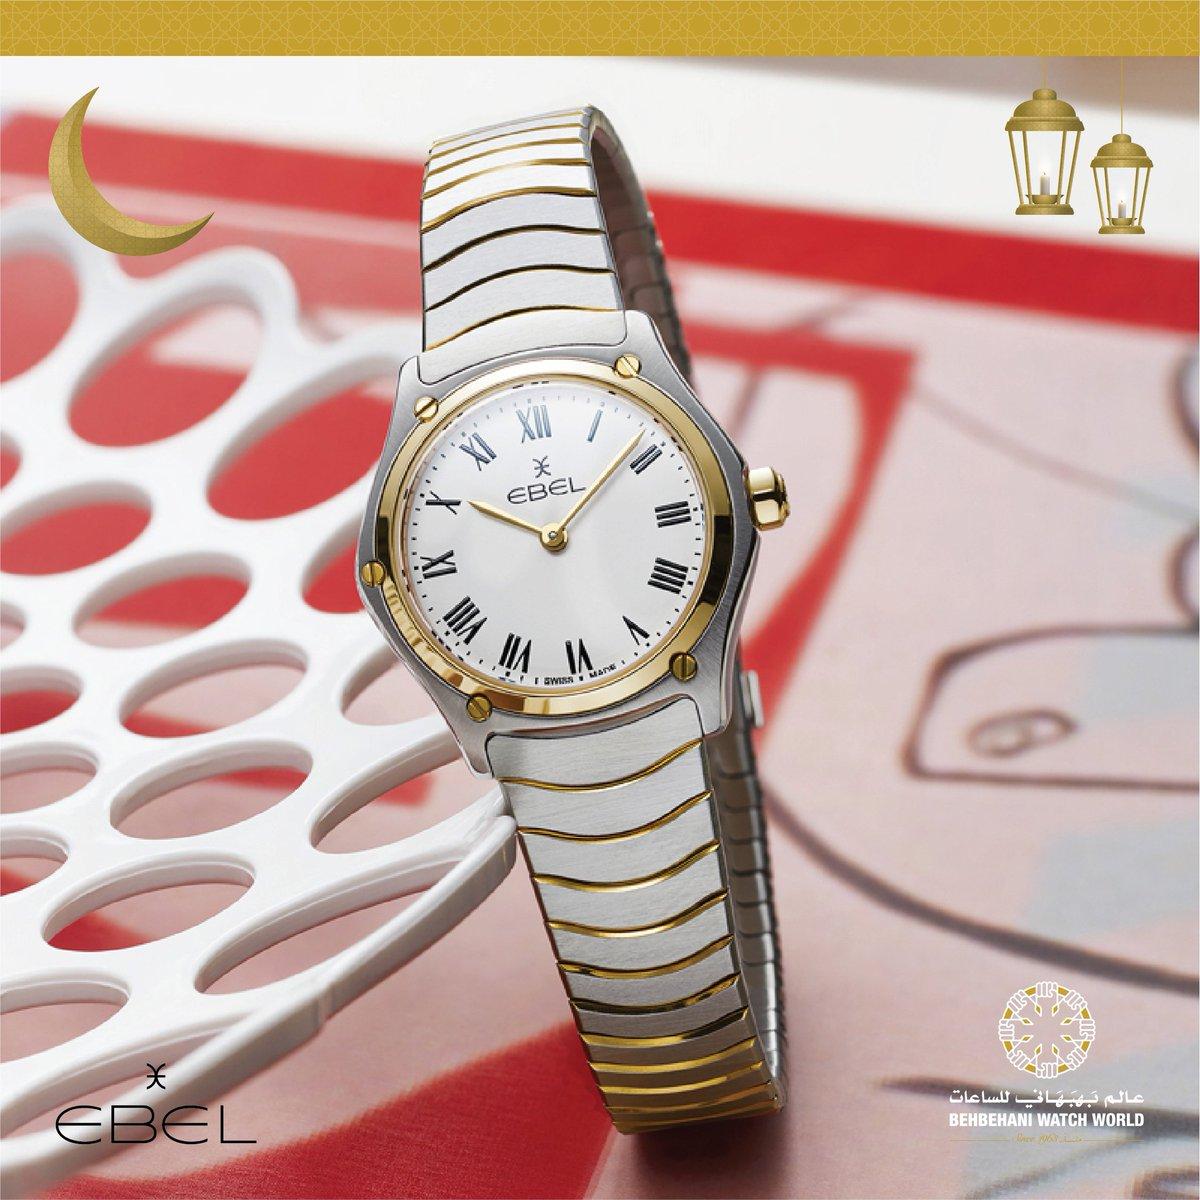 b0d28570b ساعة إستثنائية و تصميم رائع، ساعة إيبل An exceptional watch with a fine  design: